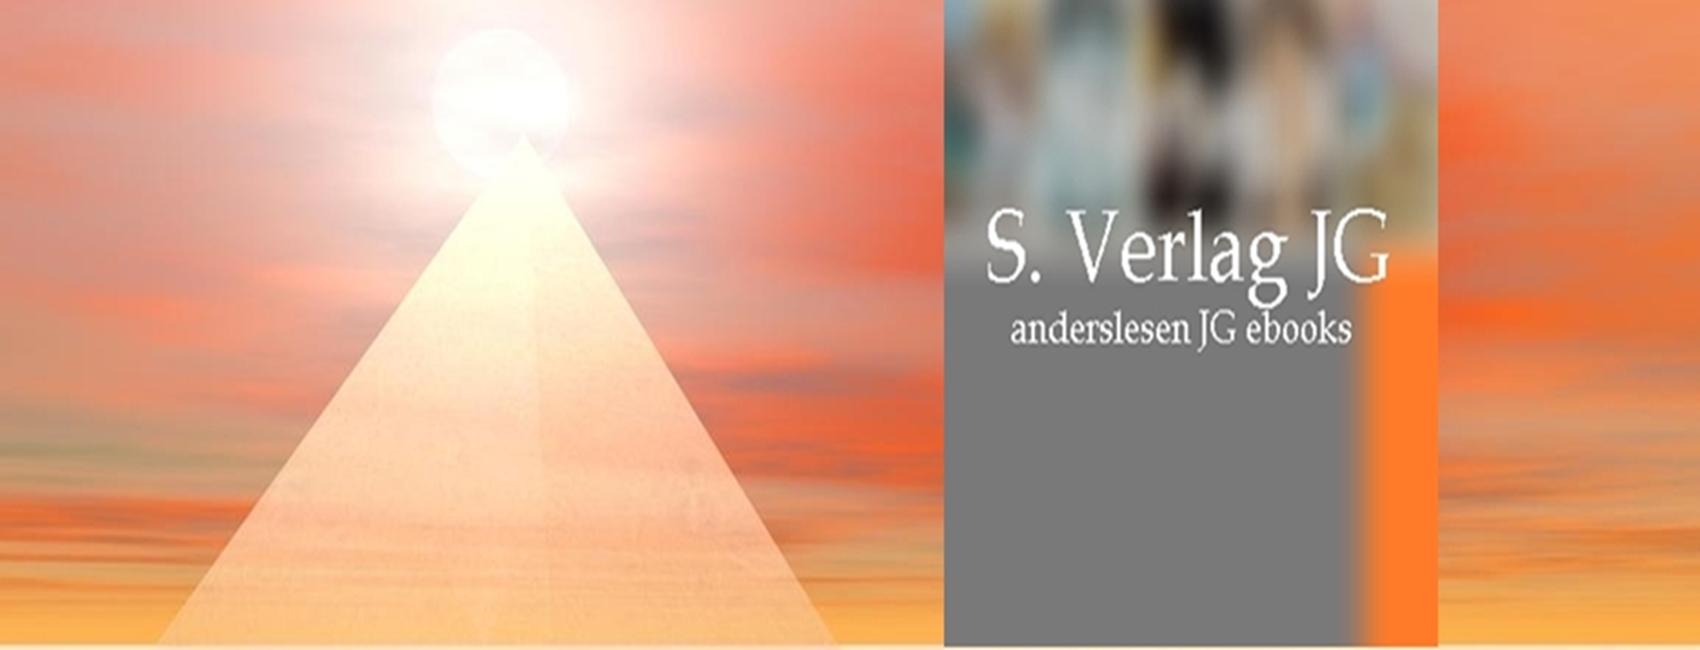 S. Verlag JG